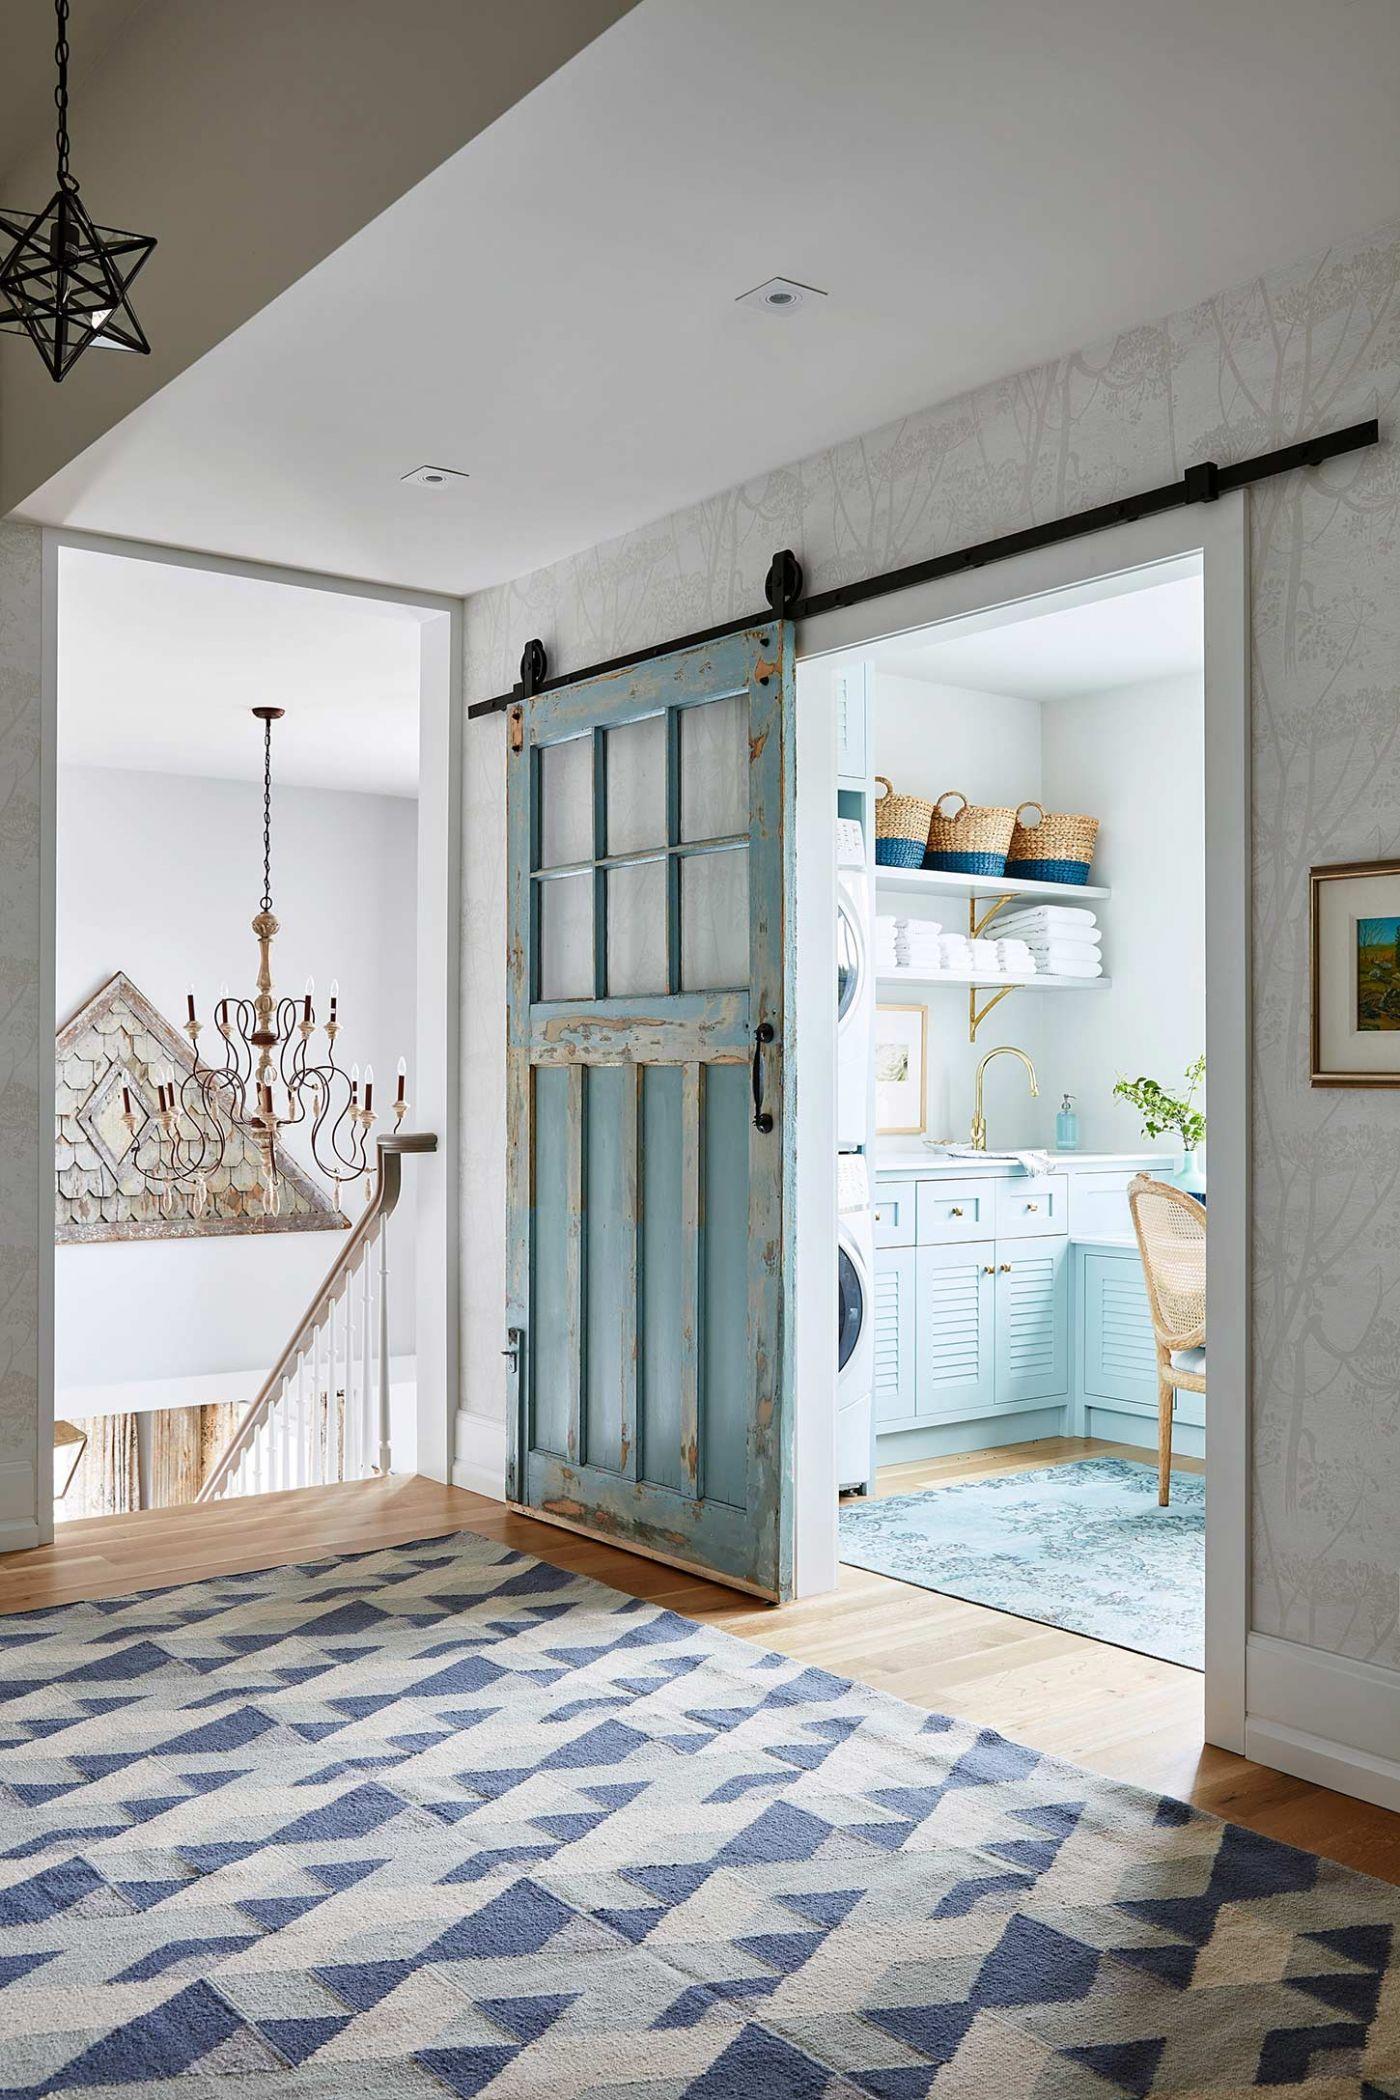 Turquoise blue vintage sliding barn door in #SarahRichardson gorgeous #farmhousestyle laundry room ... & 50 Decorating Ideas Inspired by Sarah Richardson Part 1 - Hello Lovely